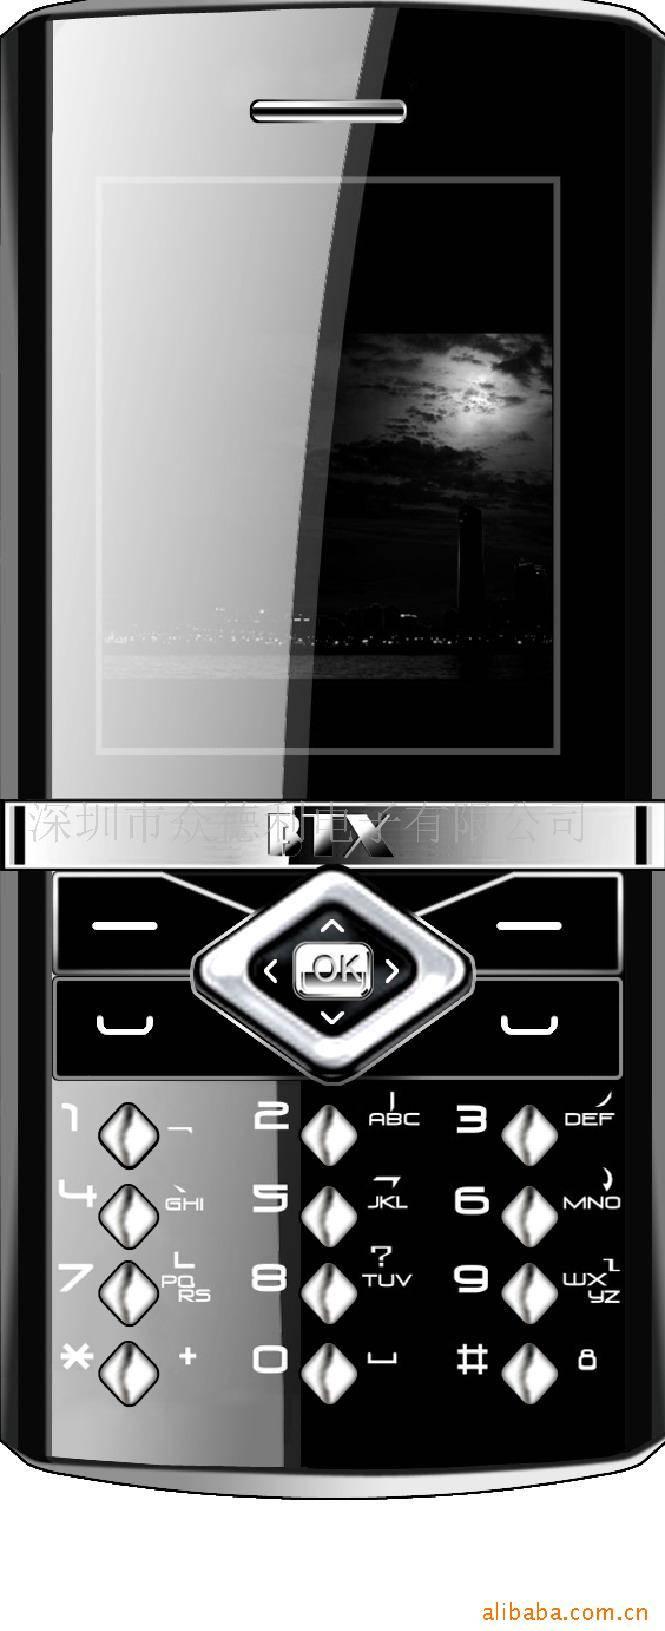 sellGSM+ CDMA 450 MHZ mobile phone